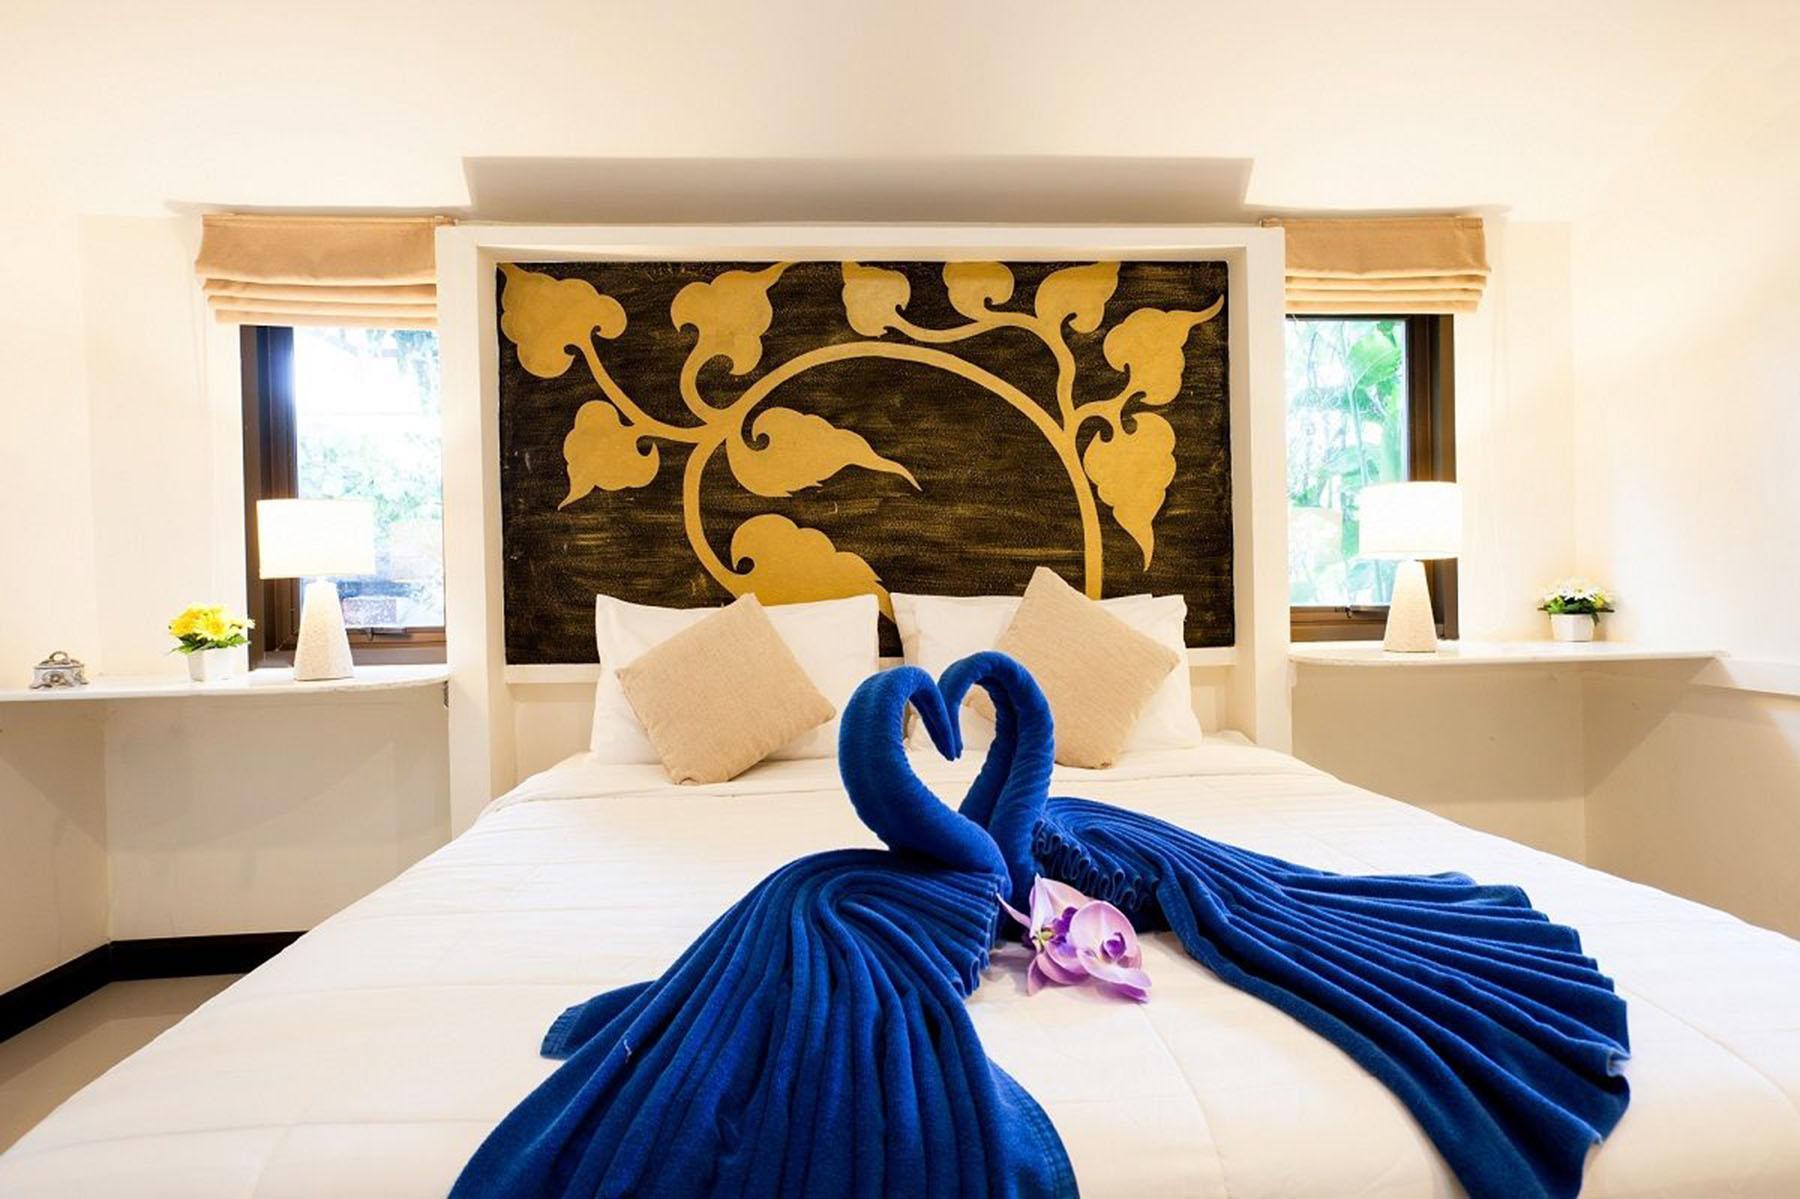 1 Bedroom Luxury Villa in Phuket Resort  for Rent วิลลา 1 ห้องนอน 1 ห้องน้ำส่วนตัว ขนาด 120 ตร.ม. – ป่าคลอก